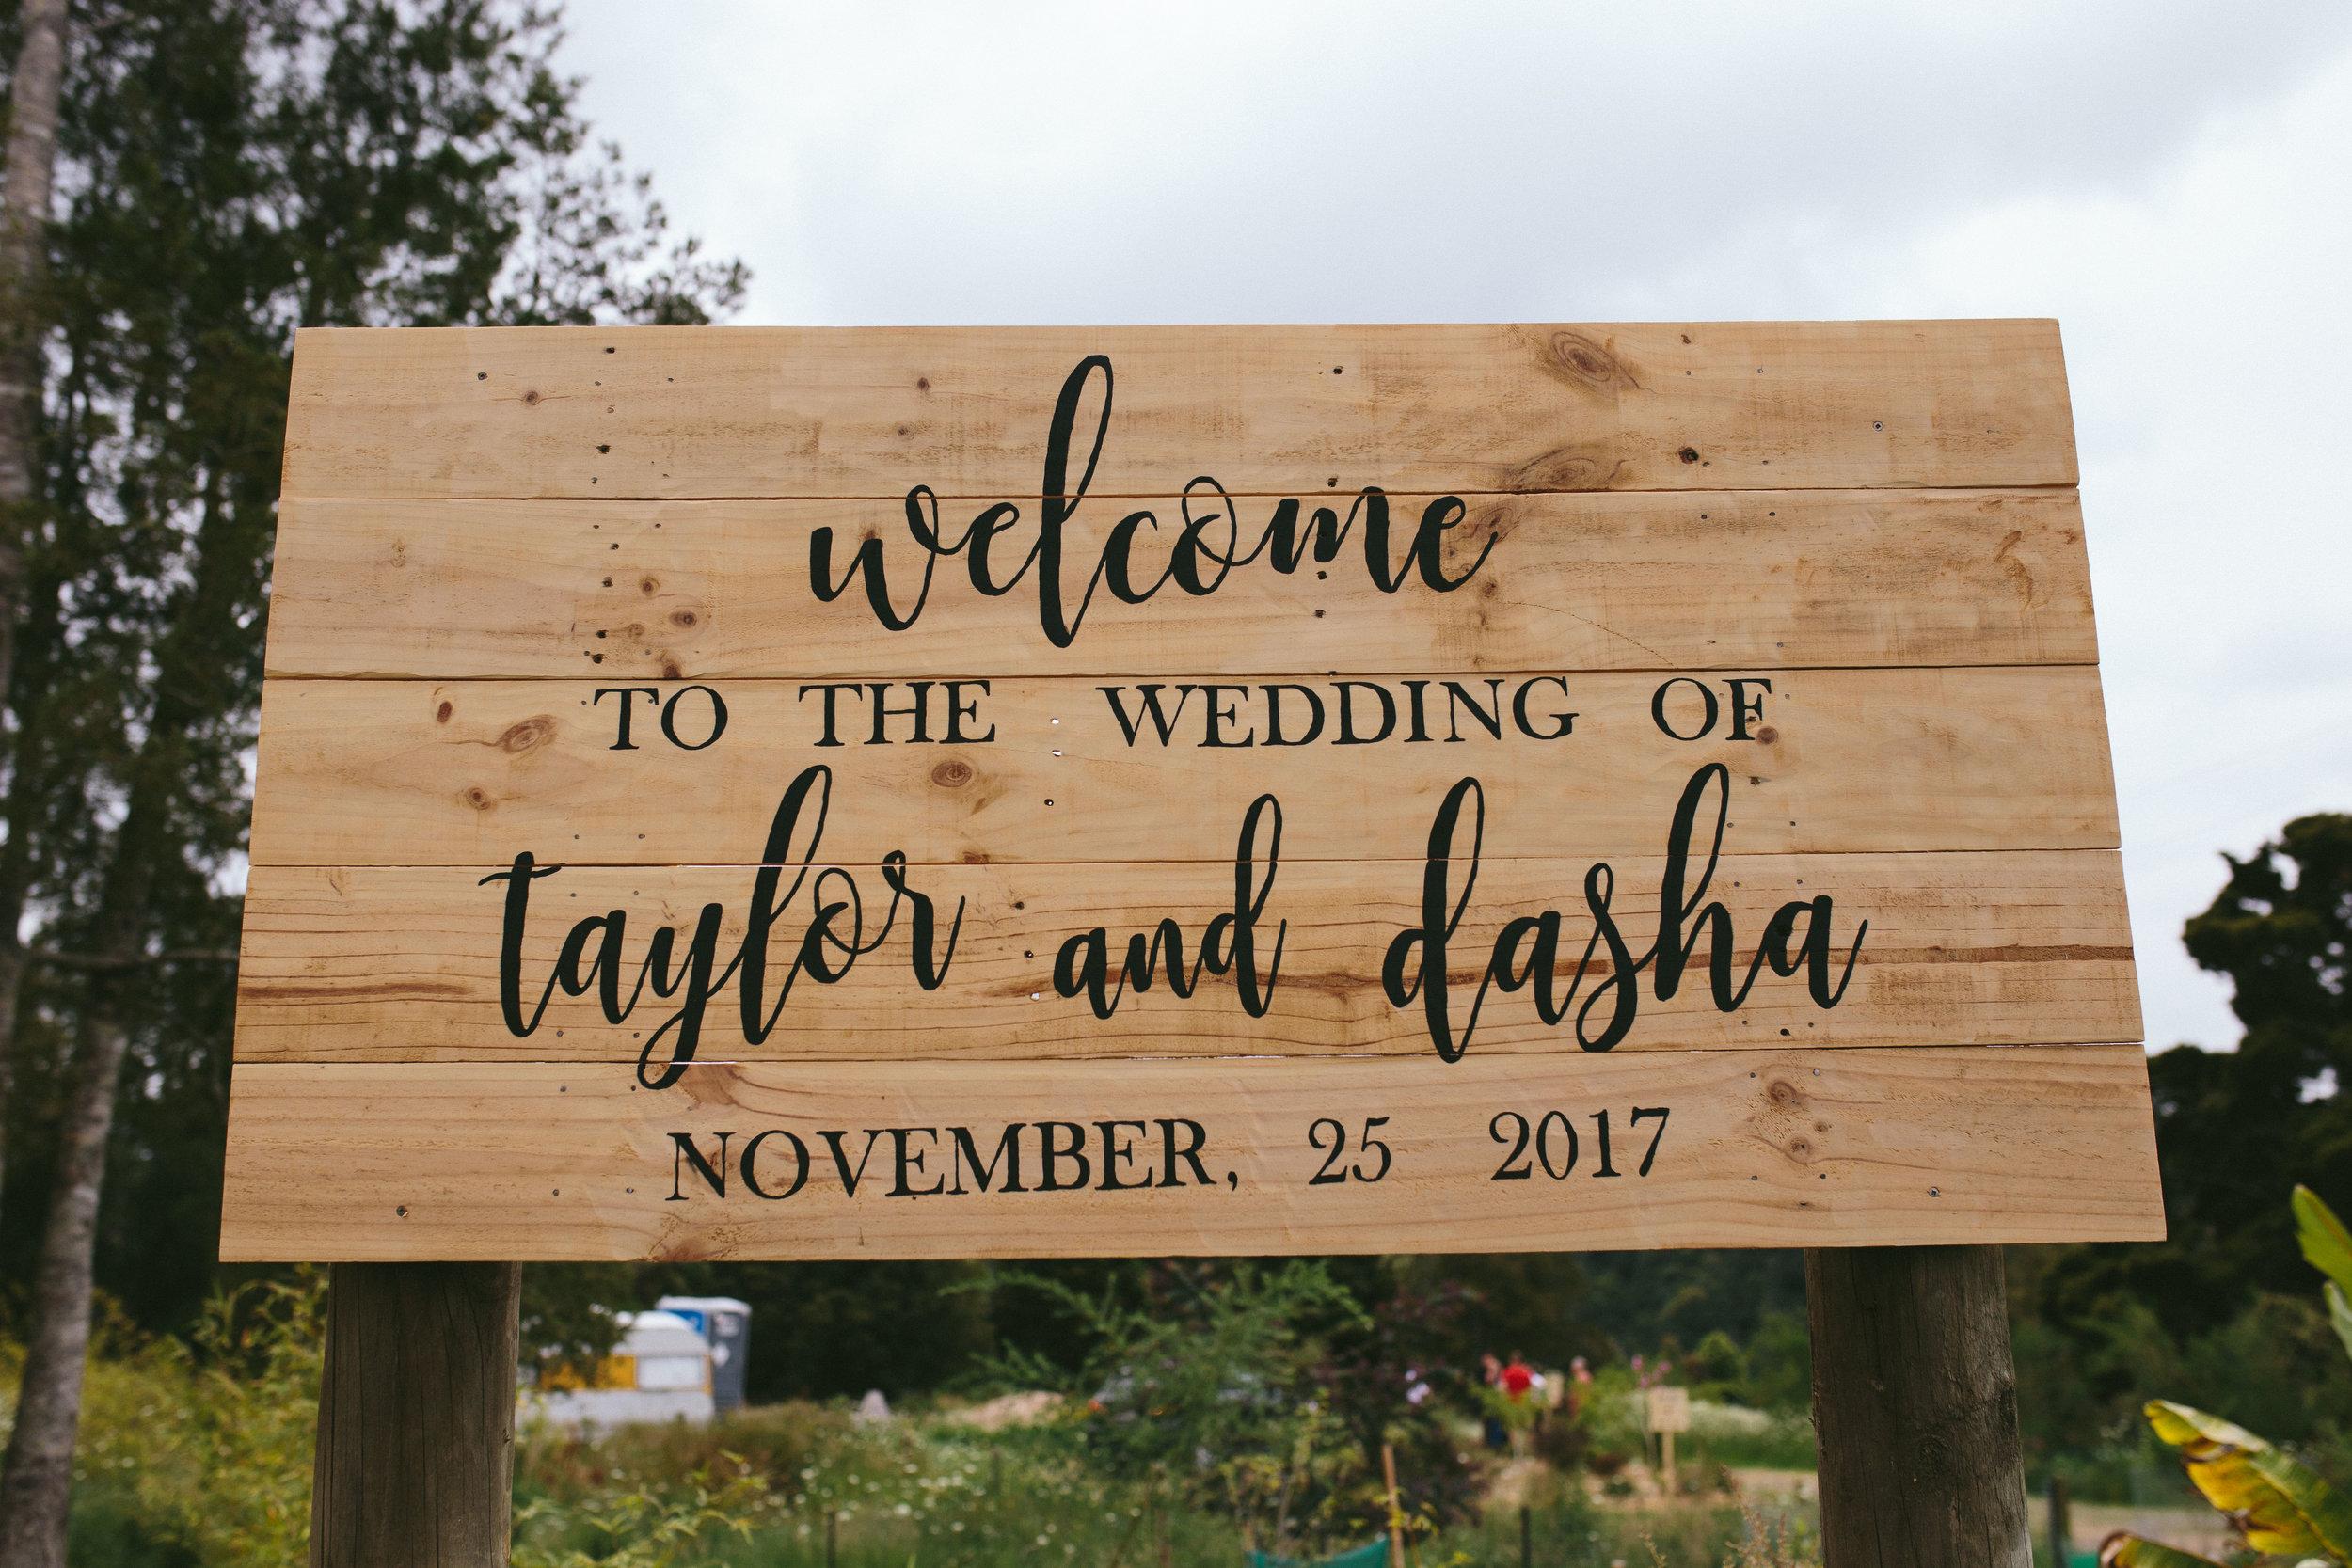 Dasha&Taylor-369.jpg